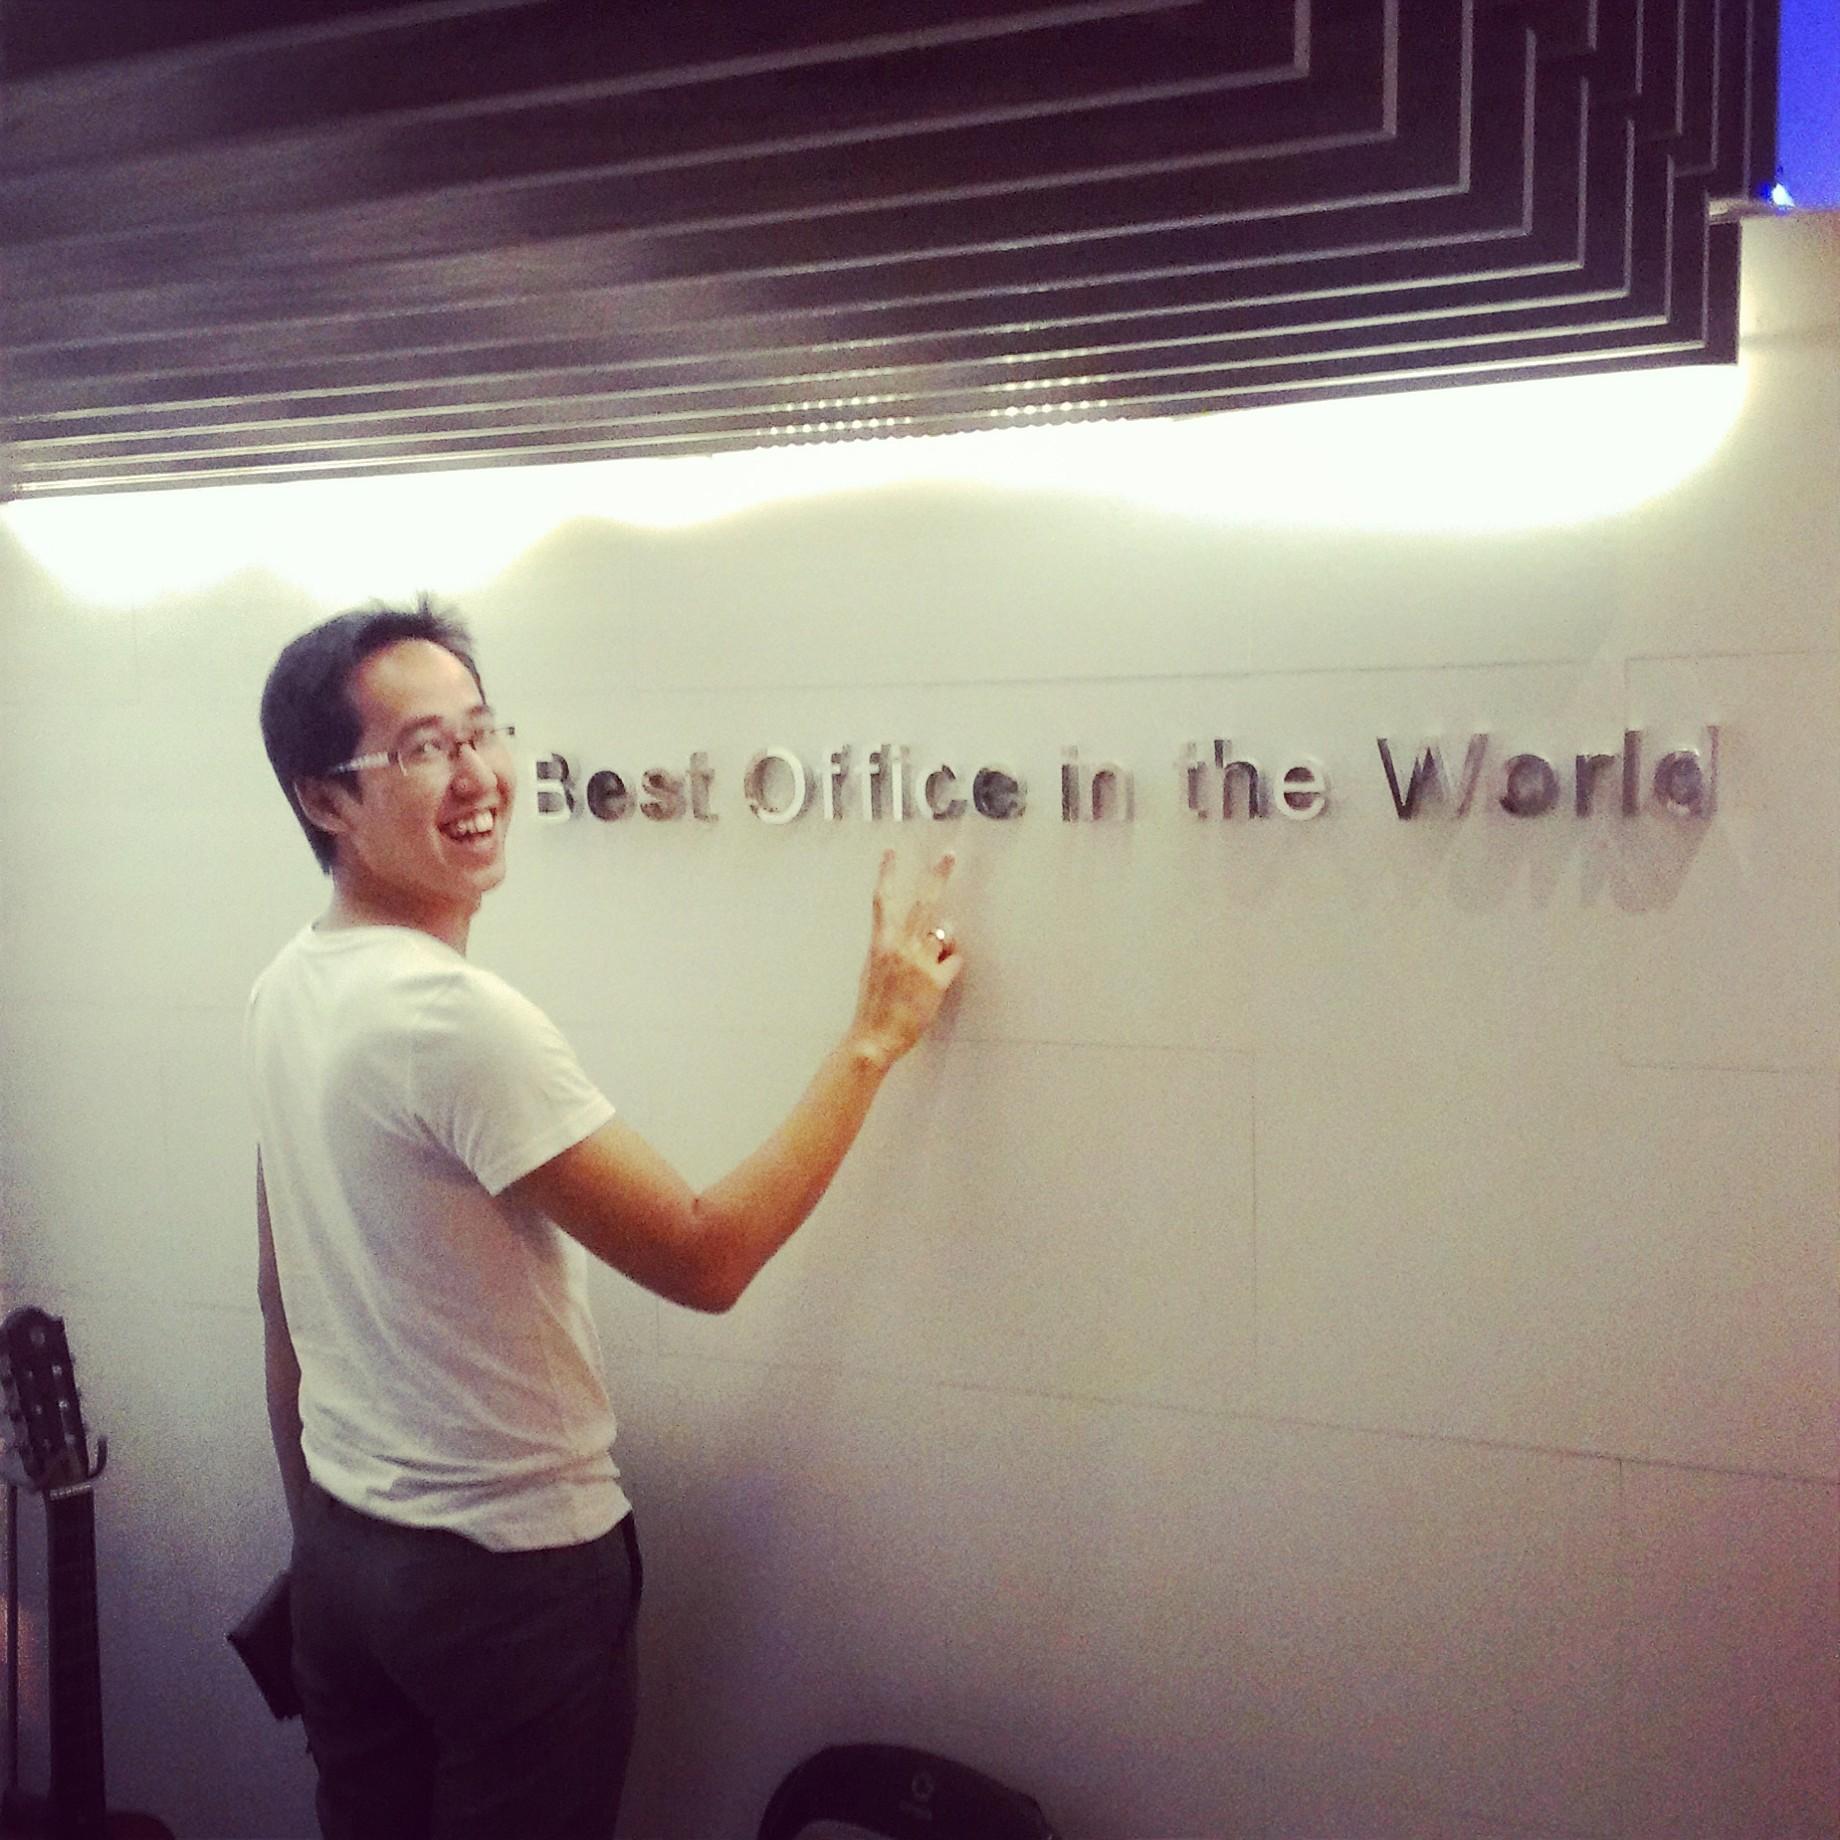 best office in the world best office in the world